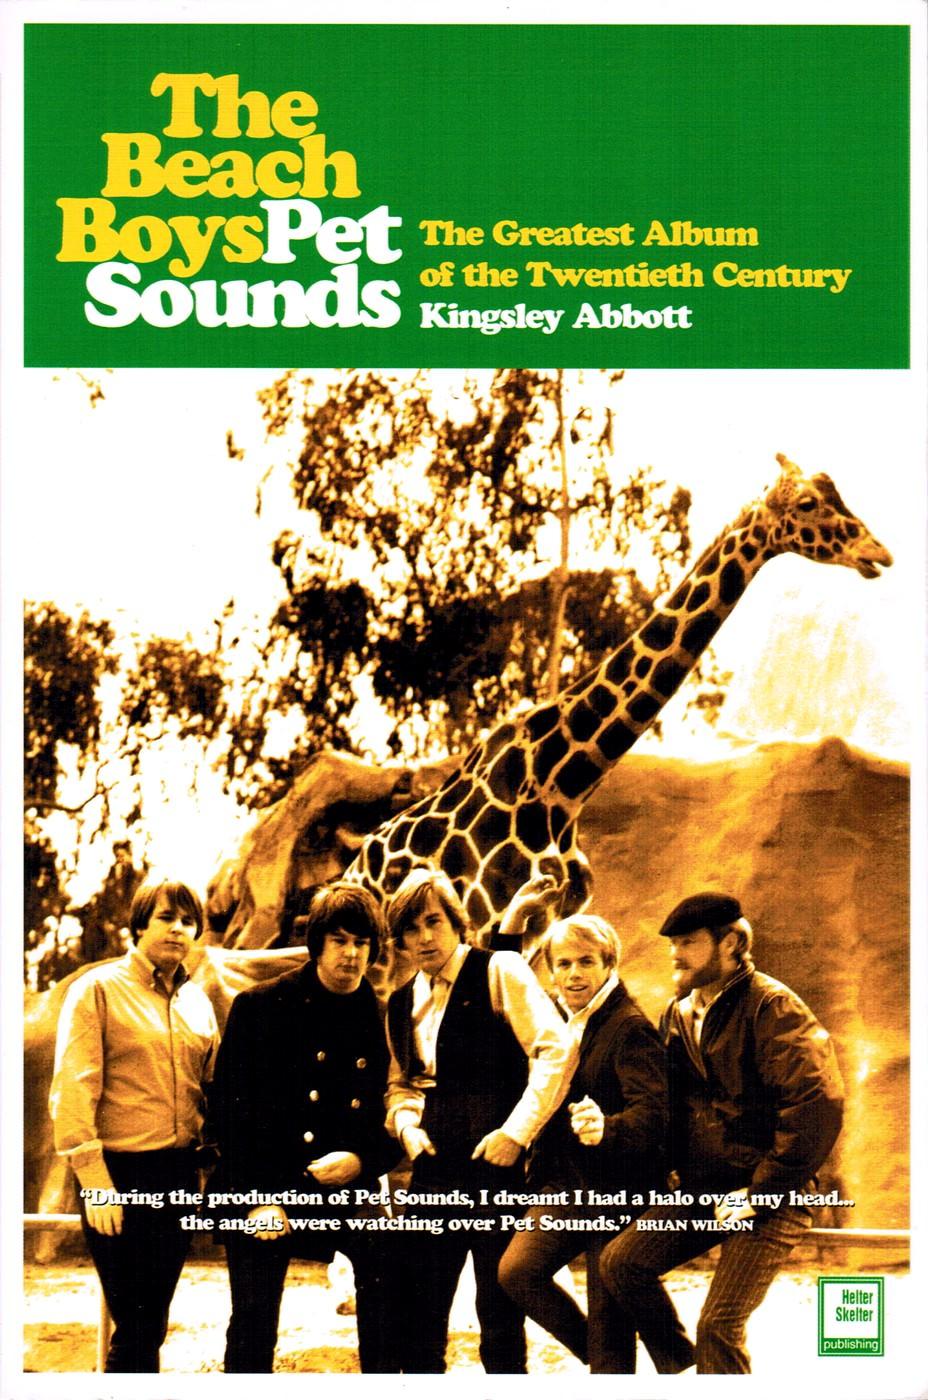 The Beach Boys Pet Sounds cover